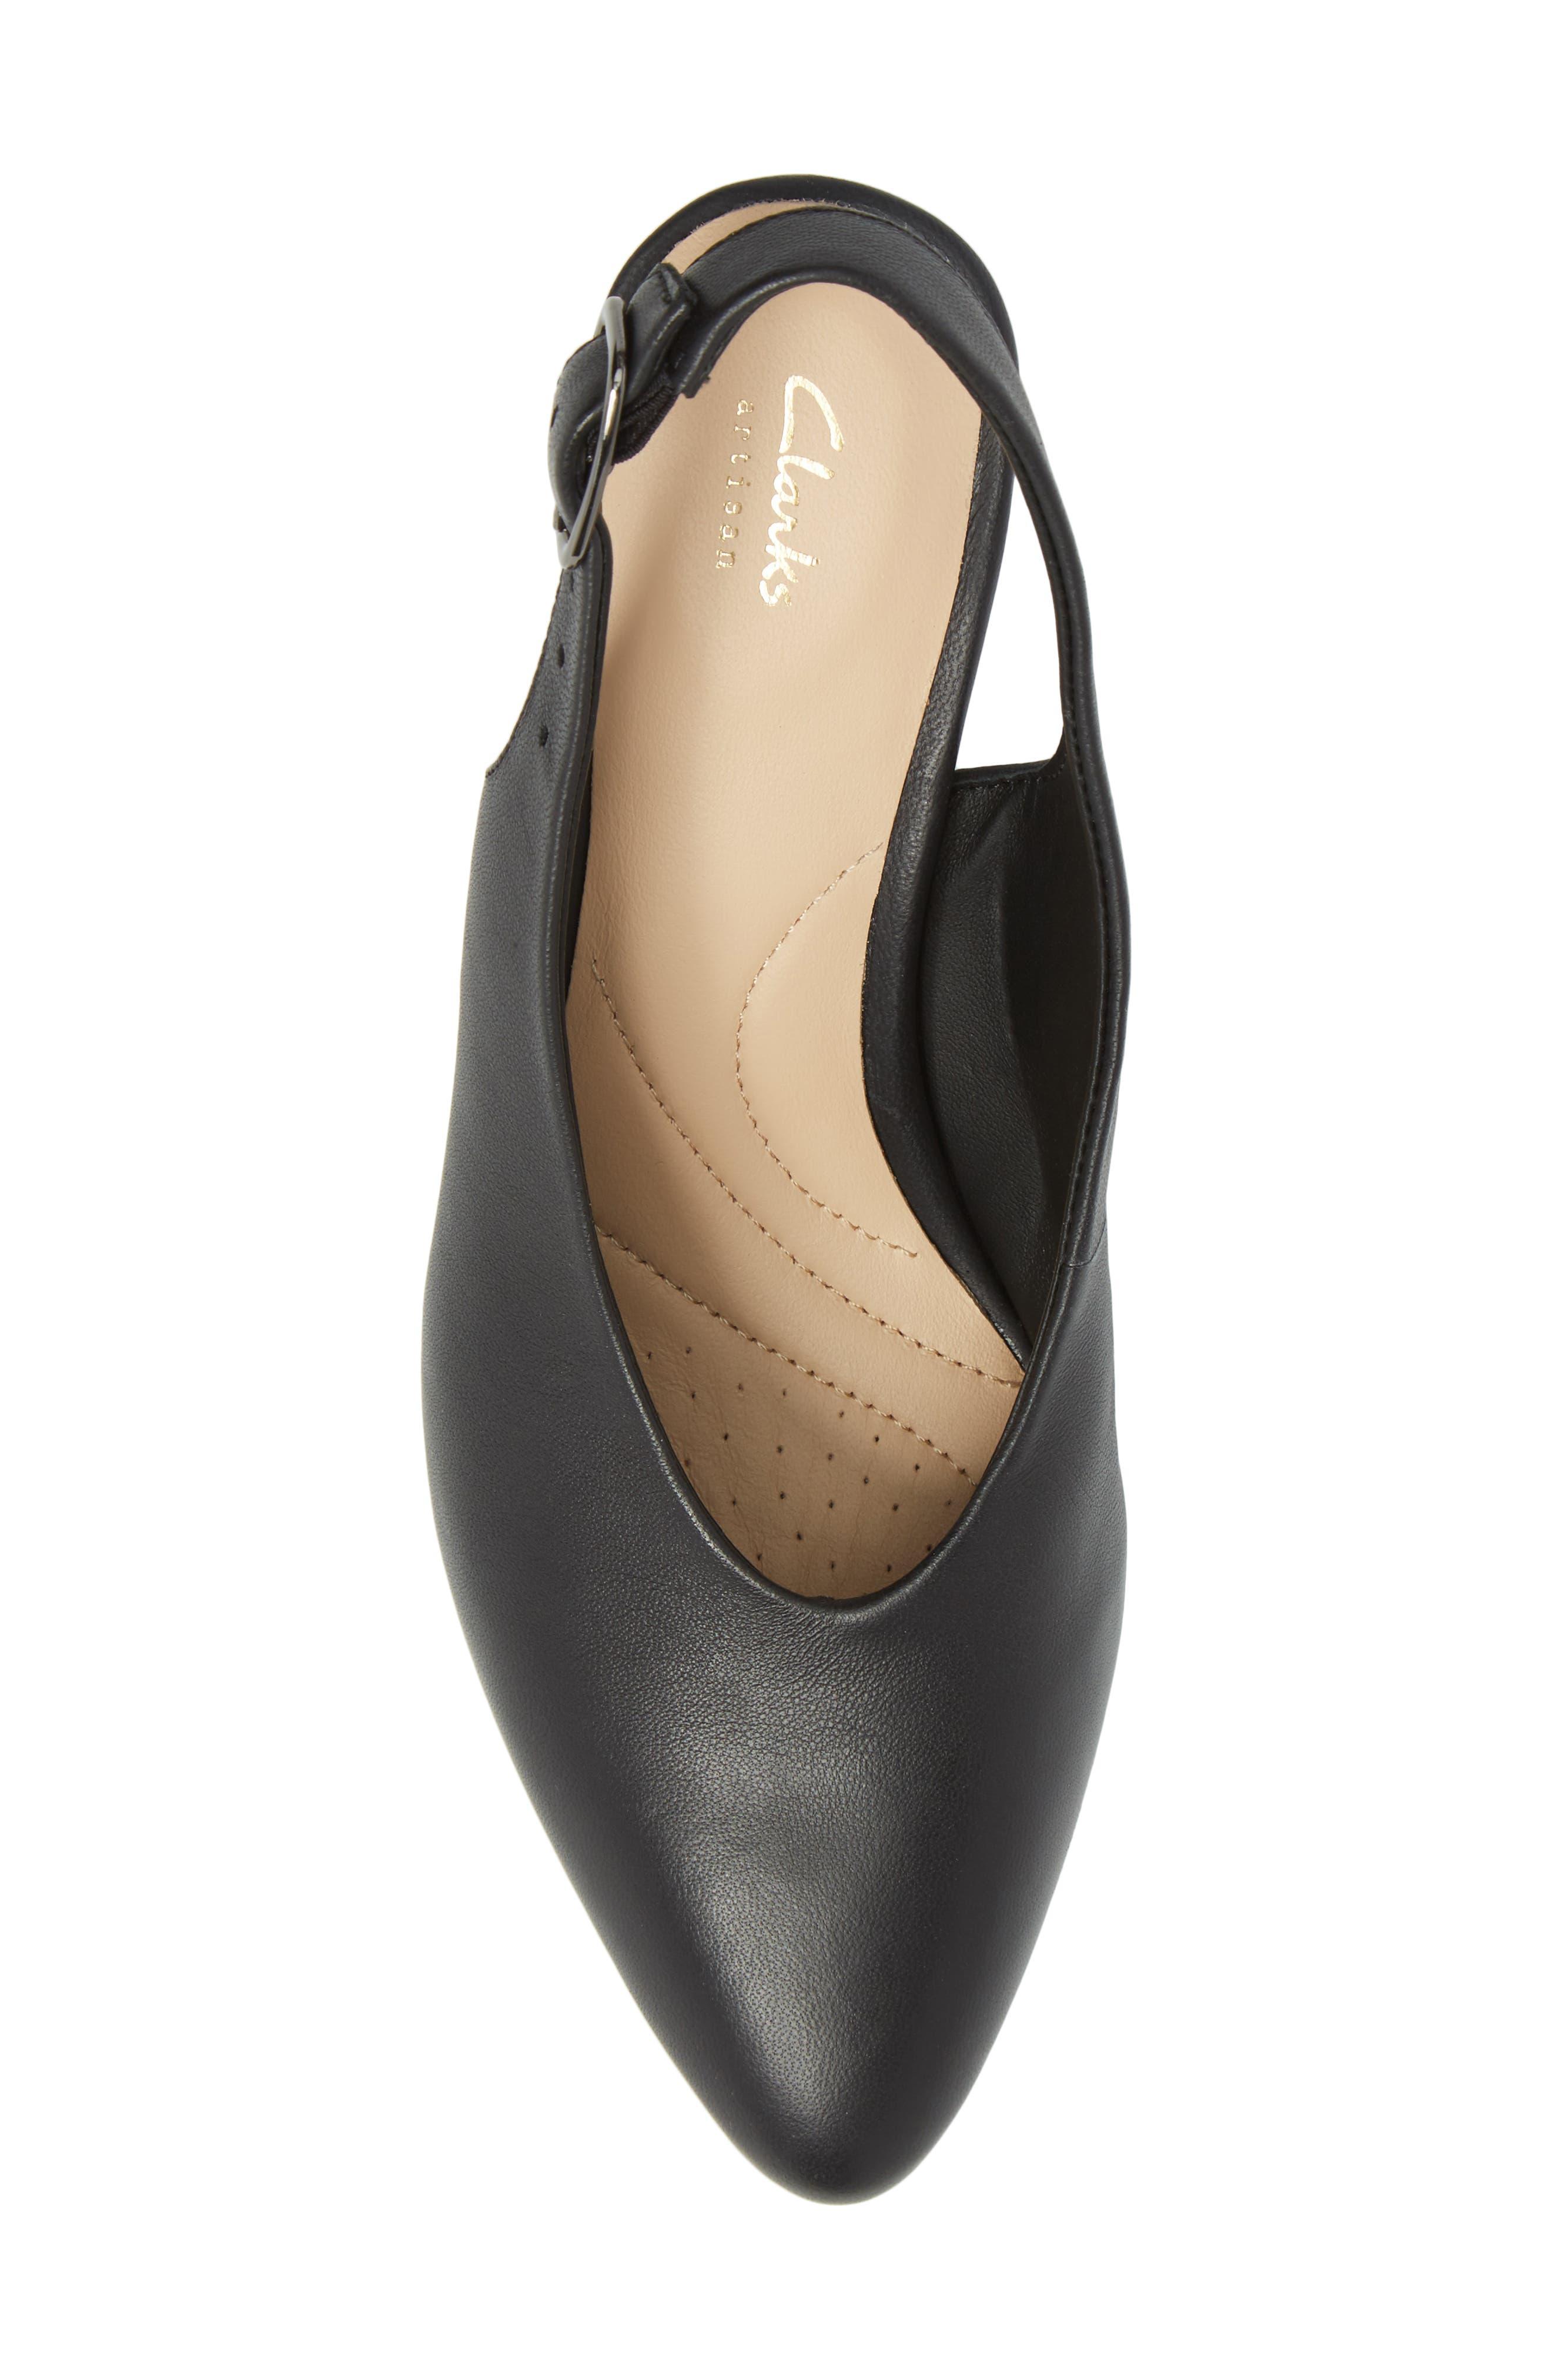 Calla Violet Kitten Heel Pump,                             Alternate thumbnail 5, color,                             Black Leather